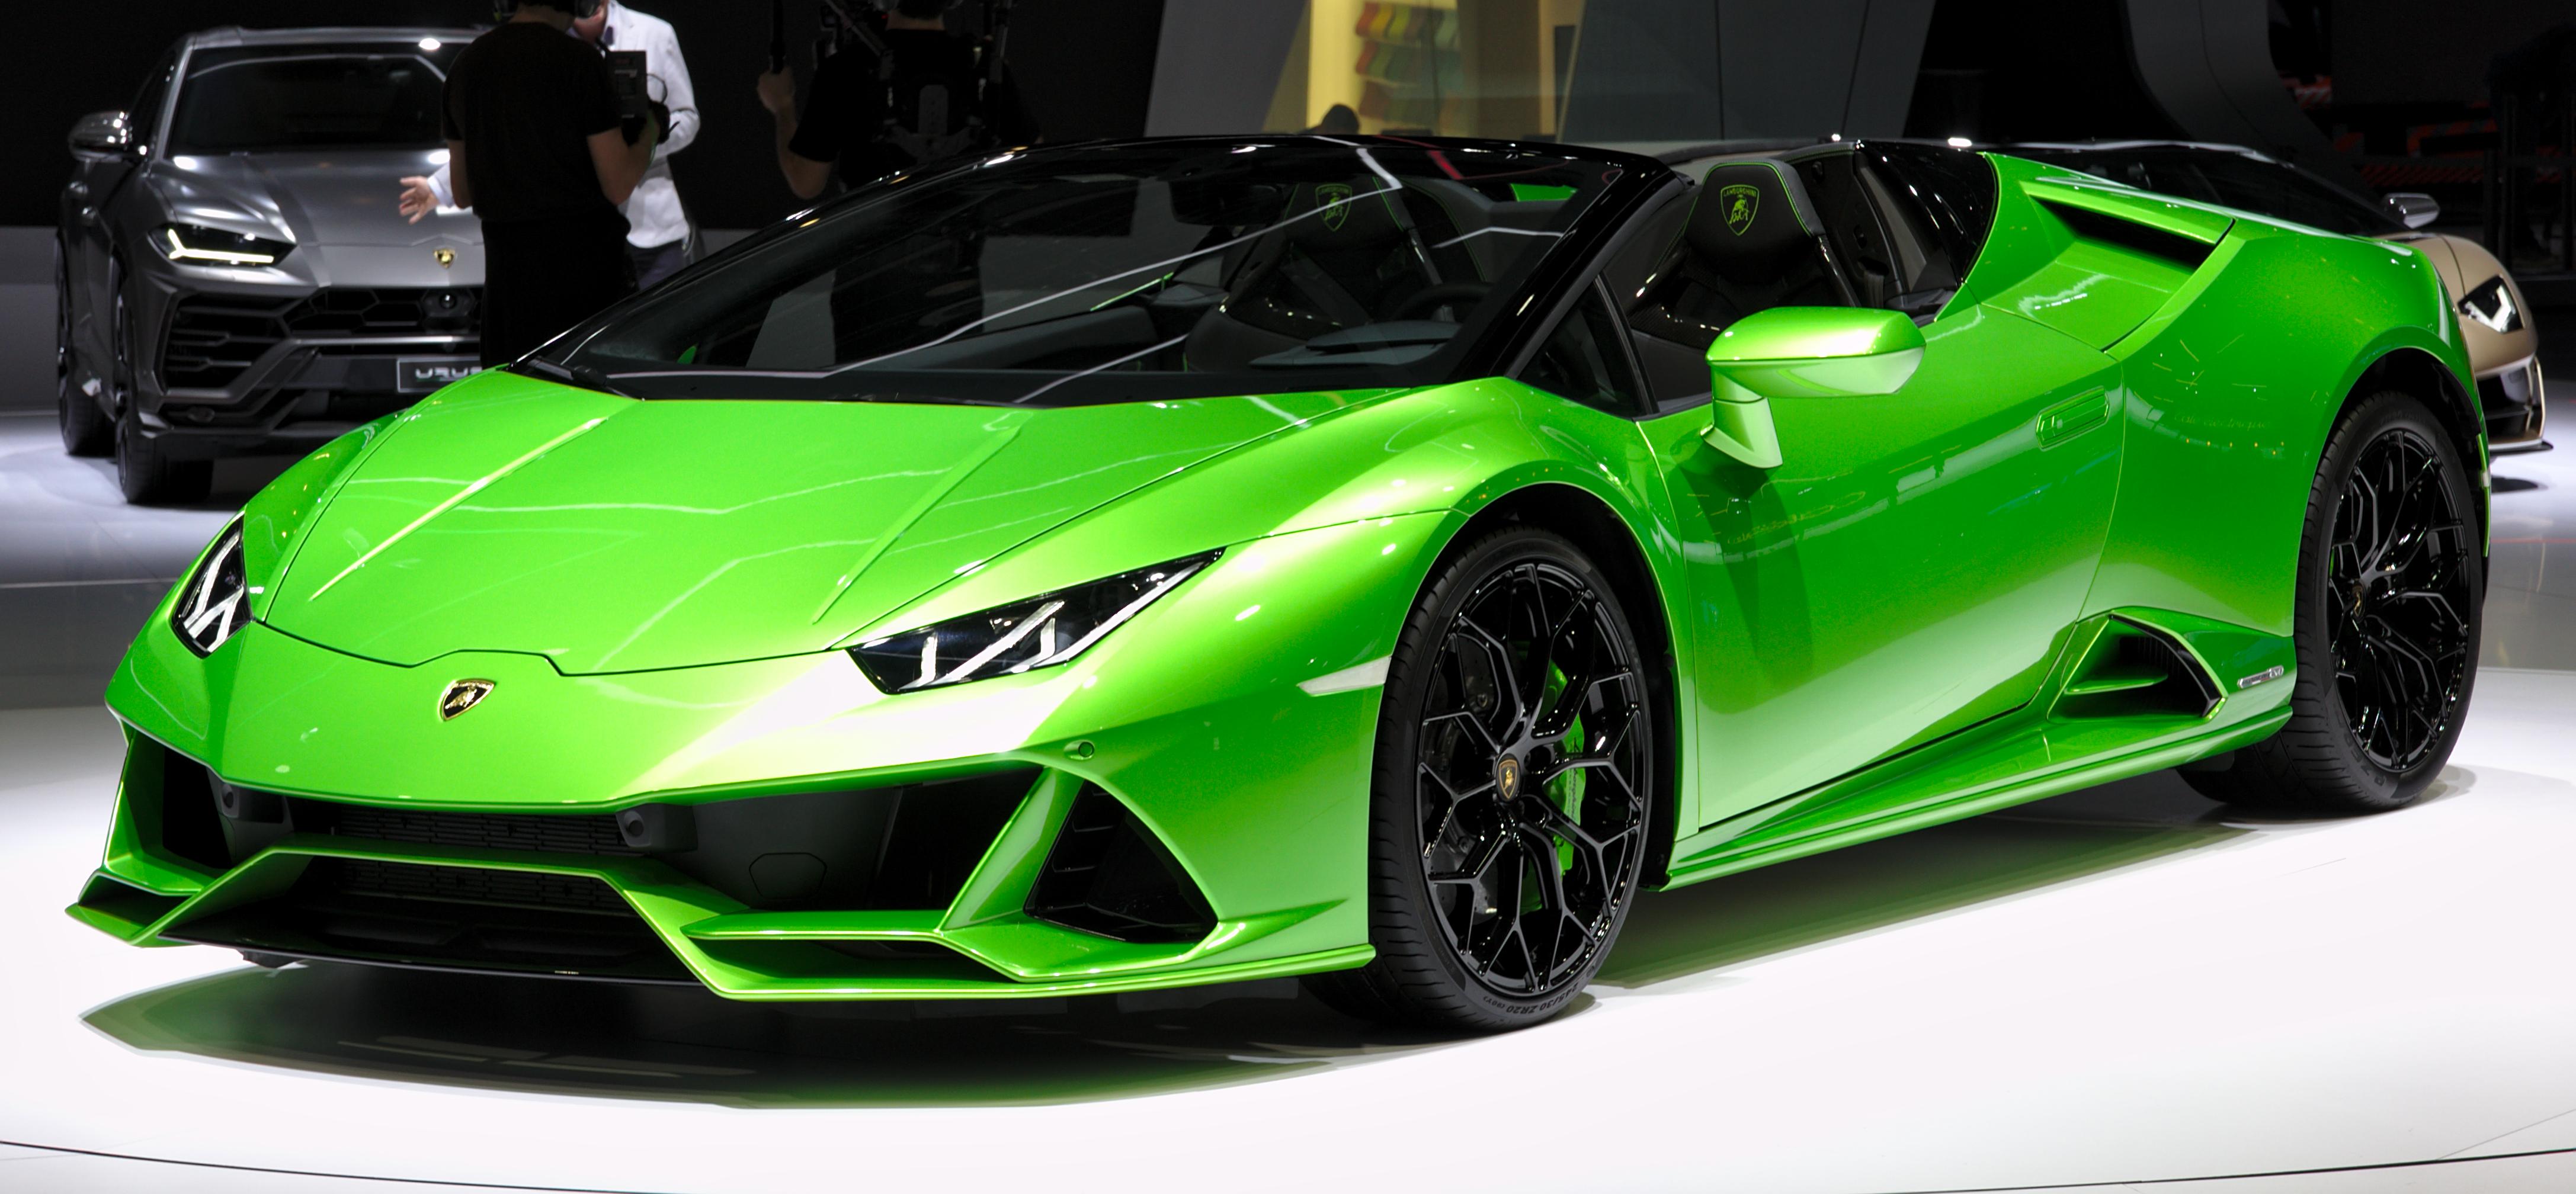 File Lamborghini Huracan Evo Spyder Genf 2019 1y7a5556 Jpg